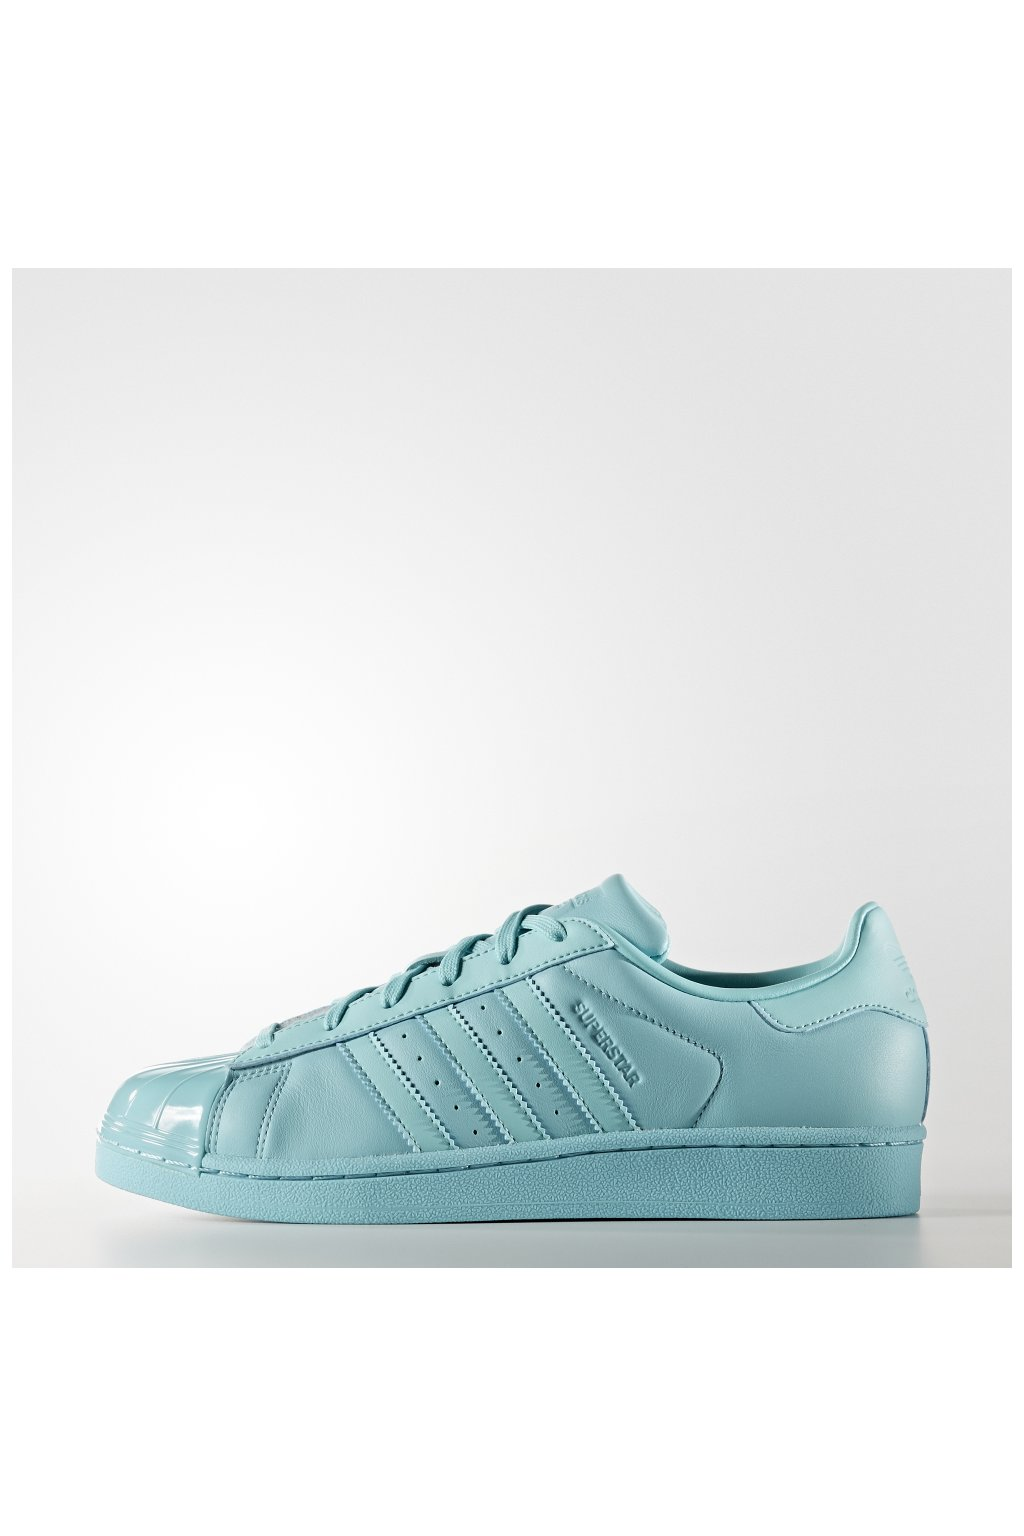 BB0529 tenisky adidas superstar glossy f